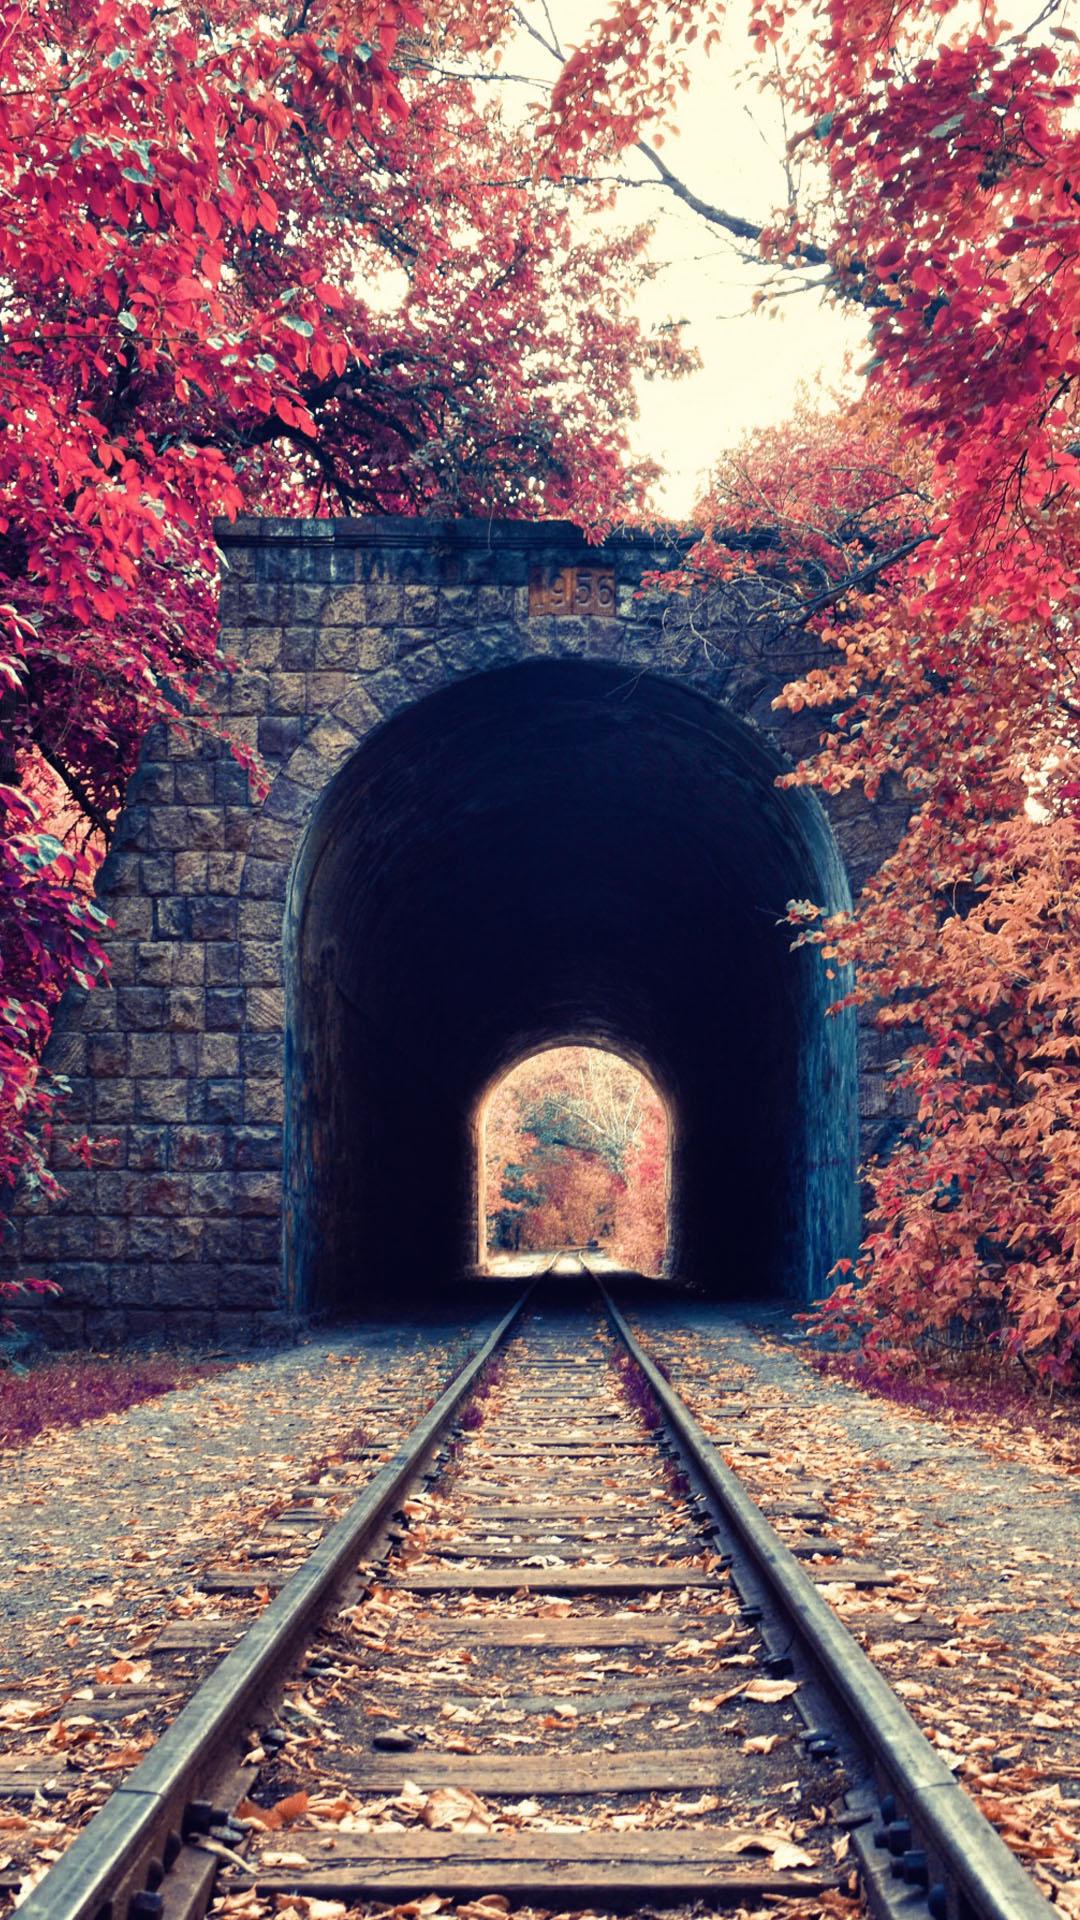 Autumn Train Tunnel Red Tree Leaves iPhone 6 Plus HD Wallpaper iPod 1080x1920